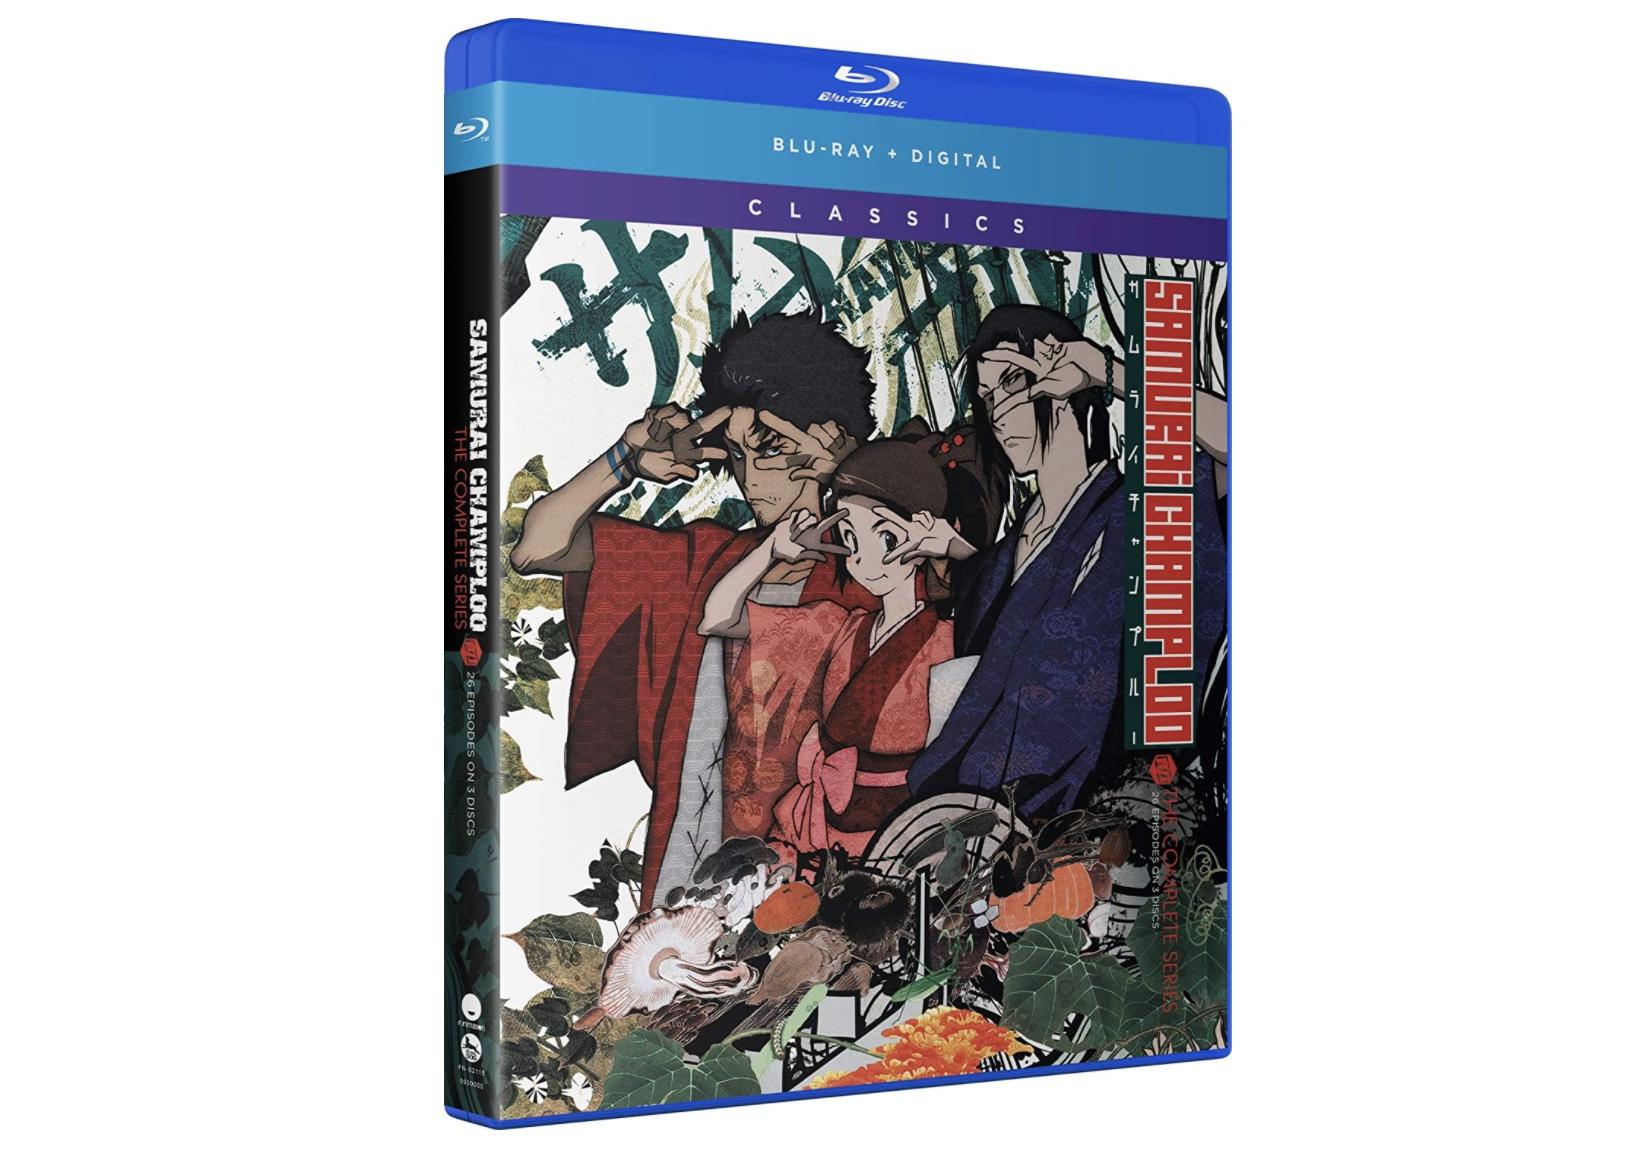 Samurai Champloo Blu-ray